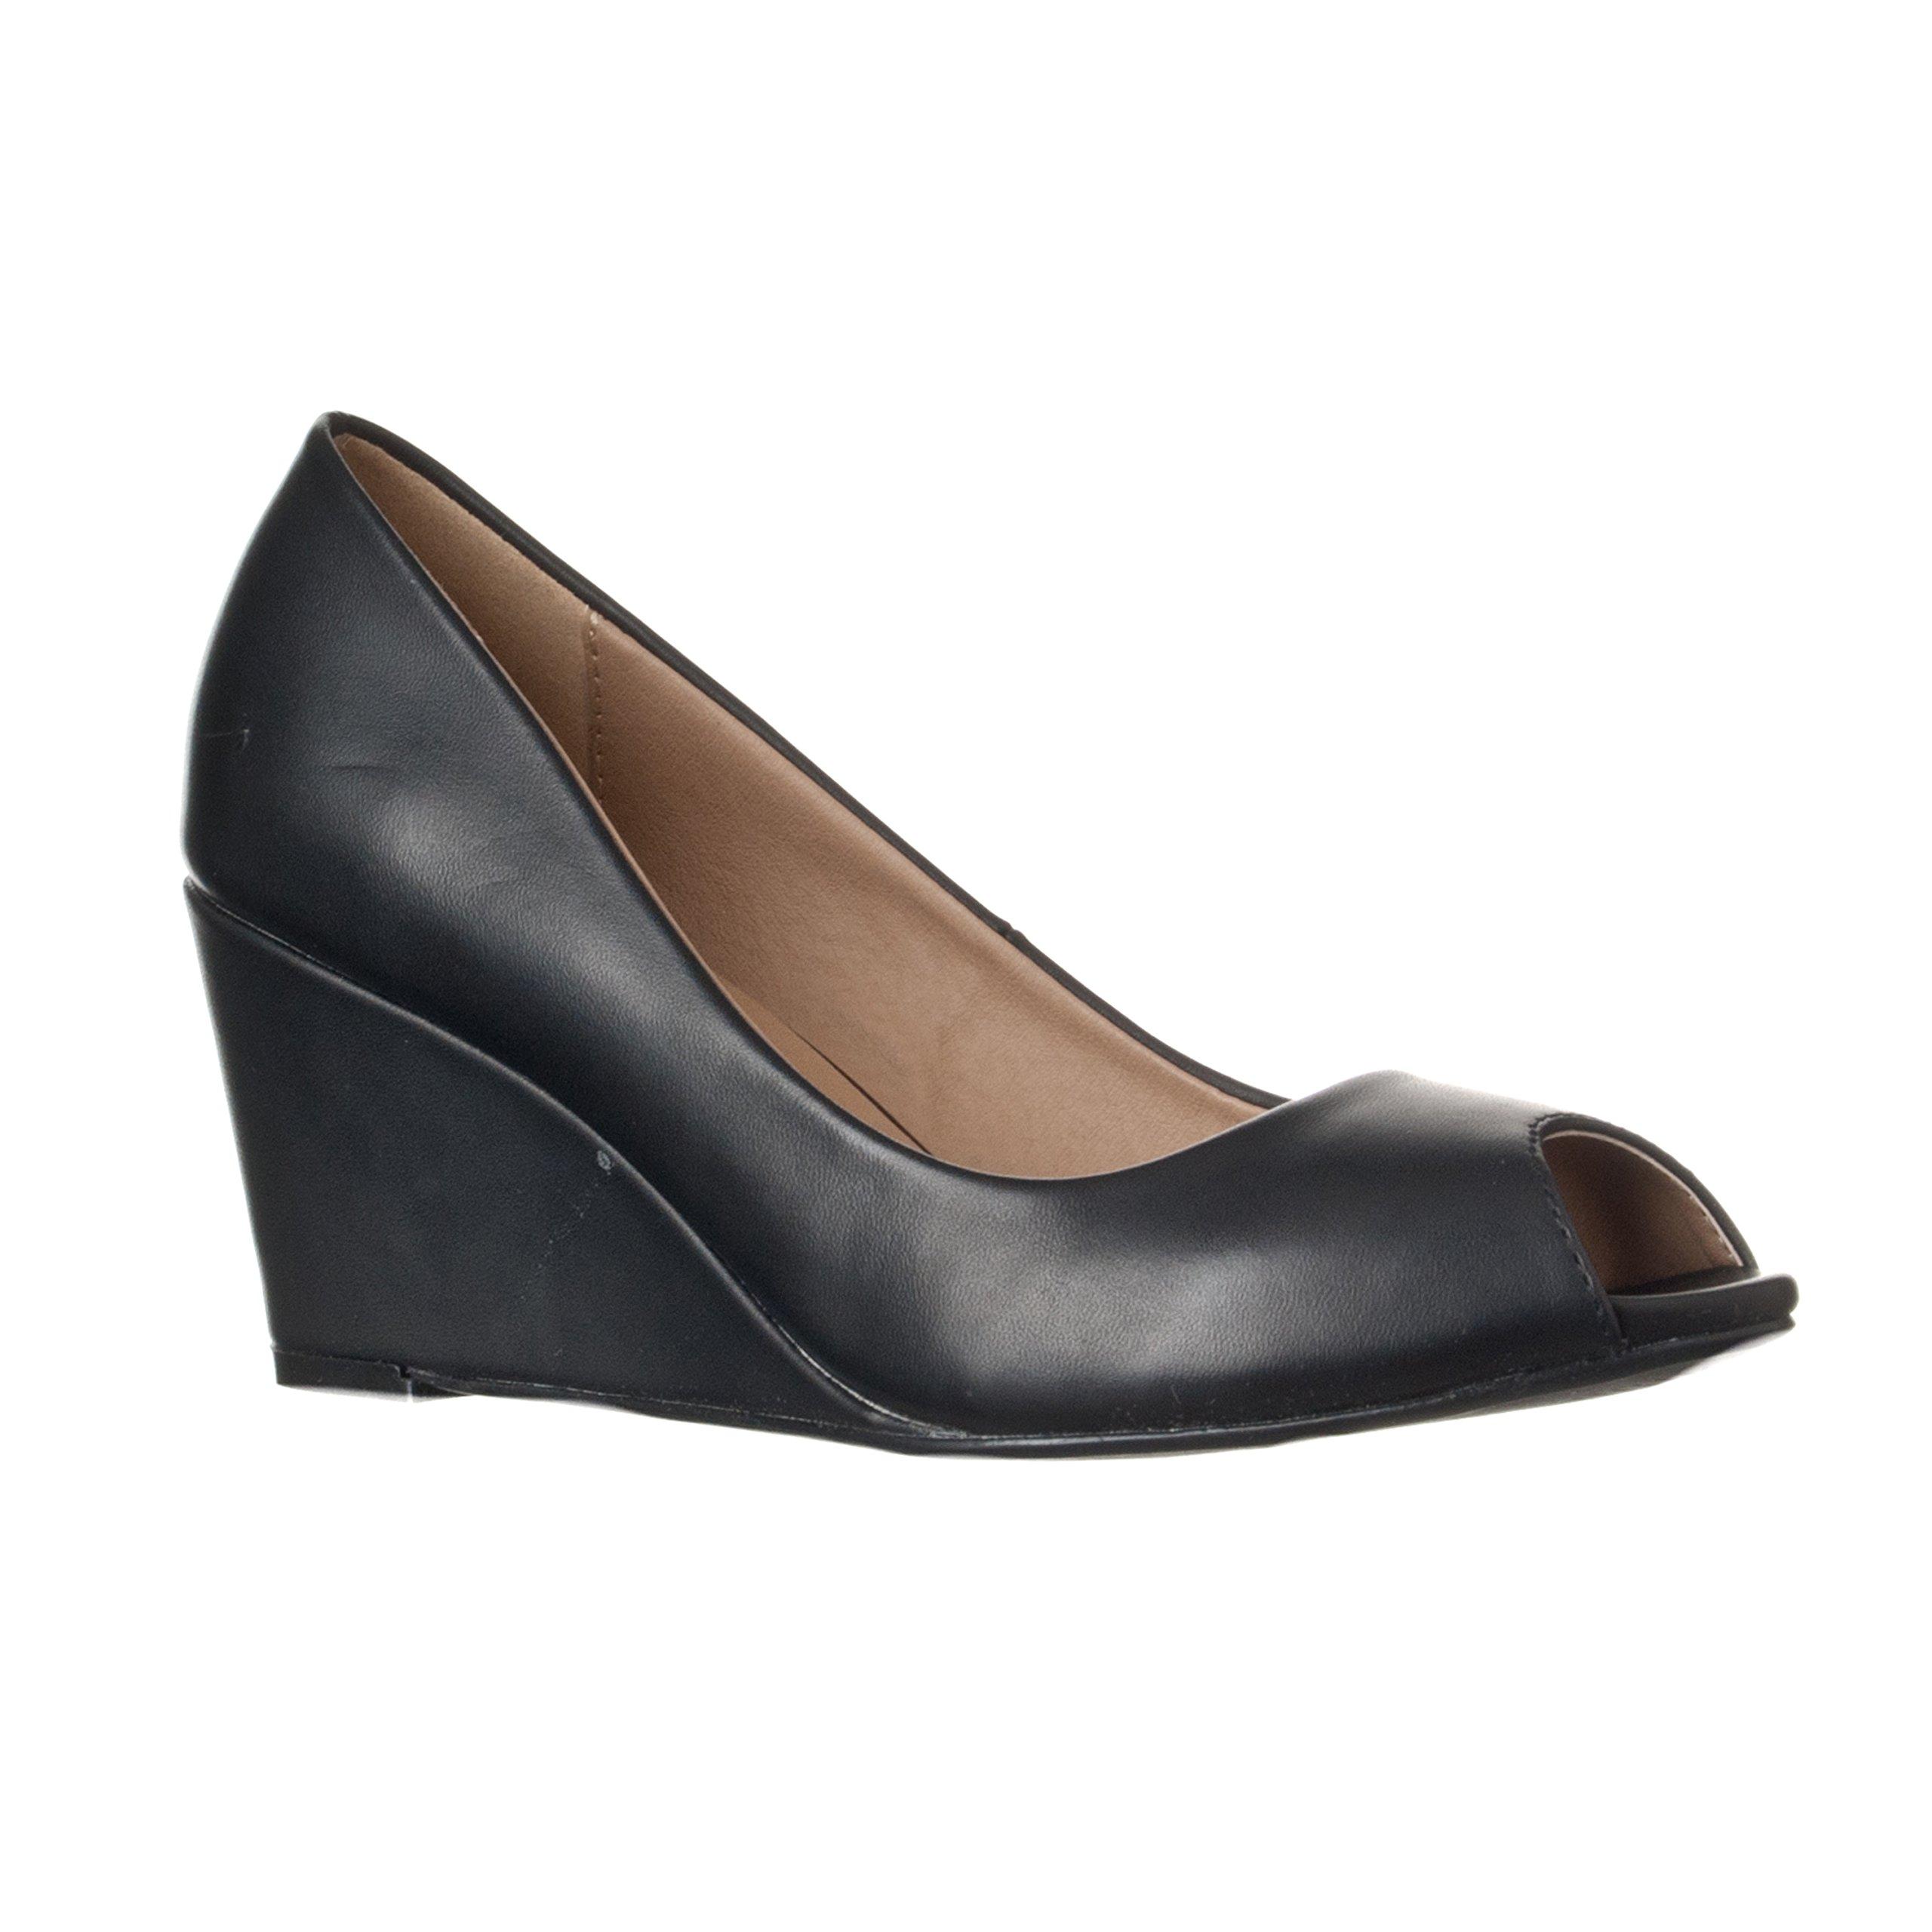 Riverberry Women's Addie Mid-Height Peep Toe Wedge Pumps, Black PU, 6.5